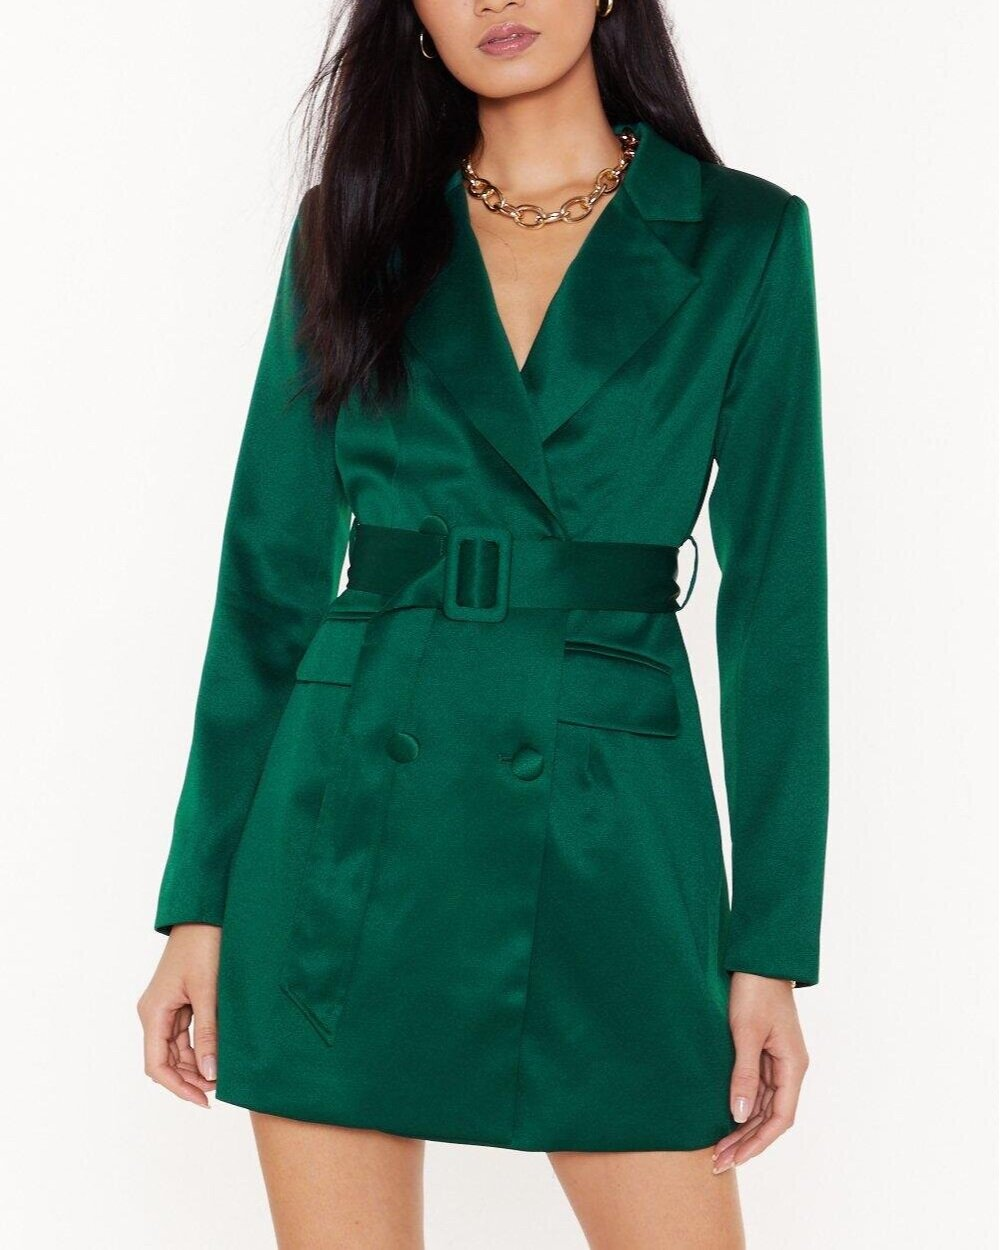 Nasty Gal Taking Care of Business Satin Blazer Dress  US$90 (~HK$706)